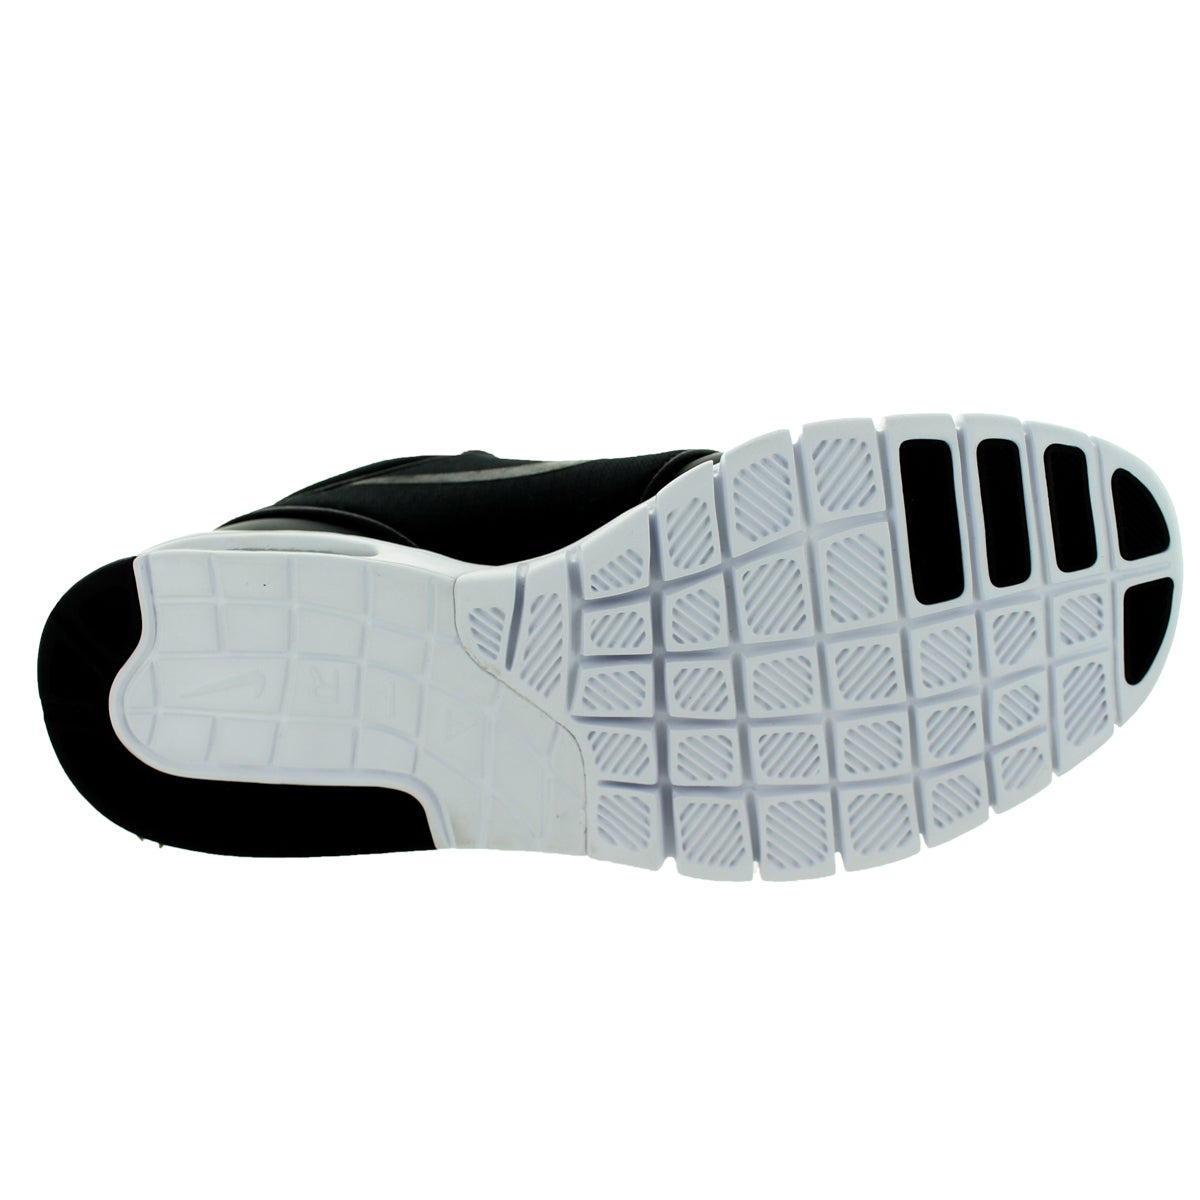 596a14f717ce Shop Nike Men s Stefan Janoski Max Mid Black Black Metallic Silver White Skate  Shoes - Free Shipping Today - Overstock - 13312081